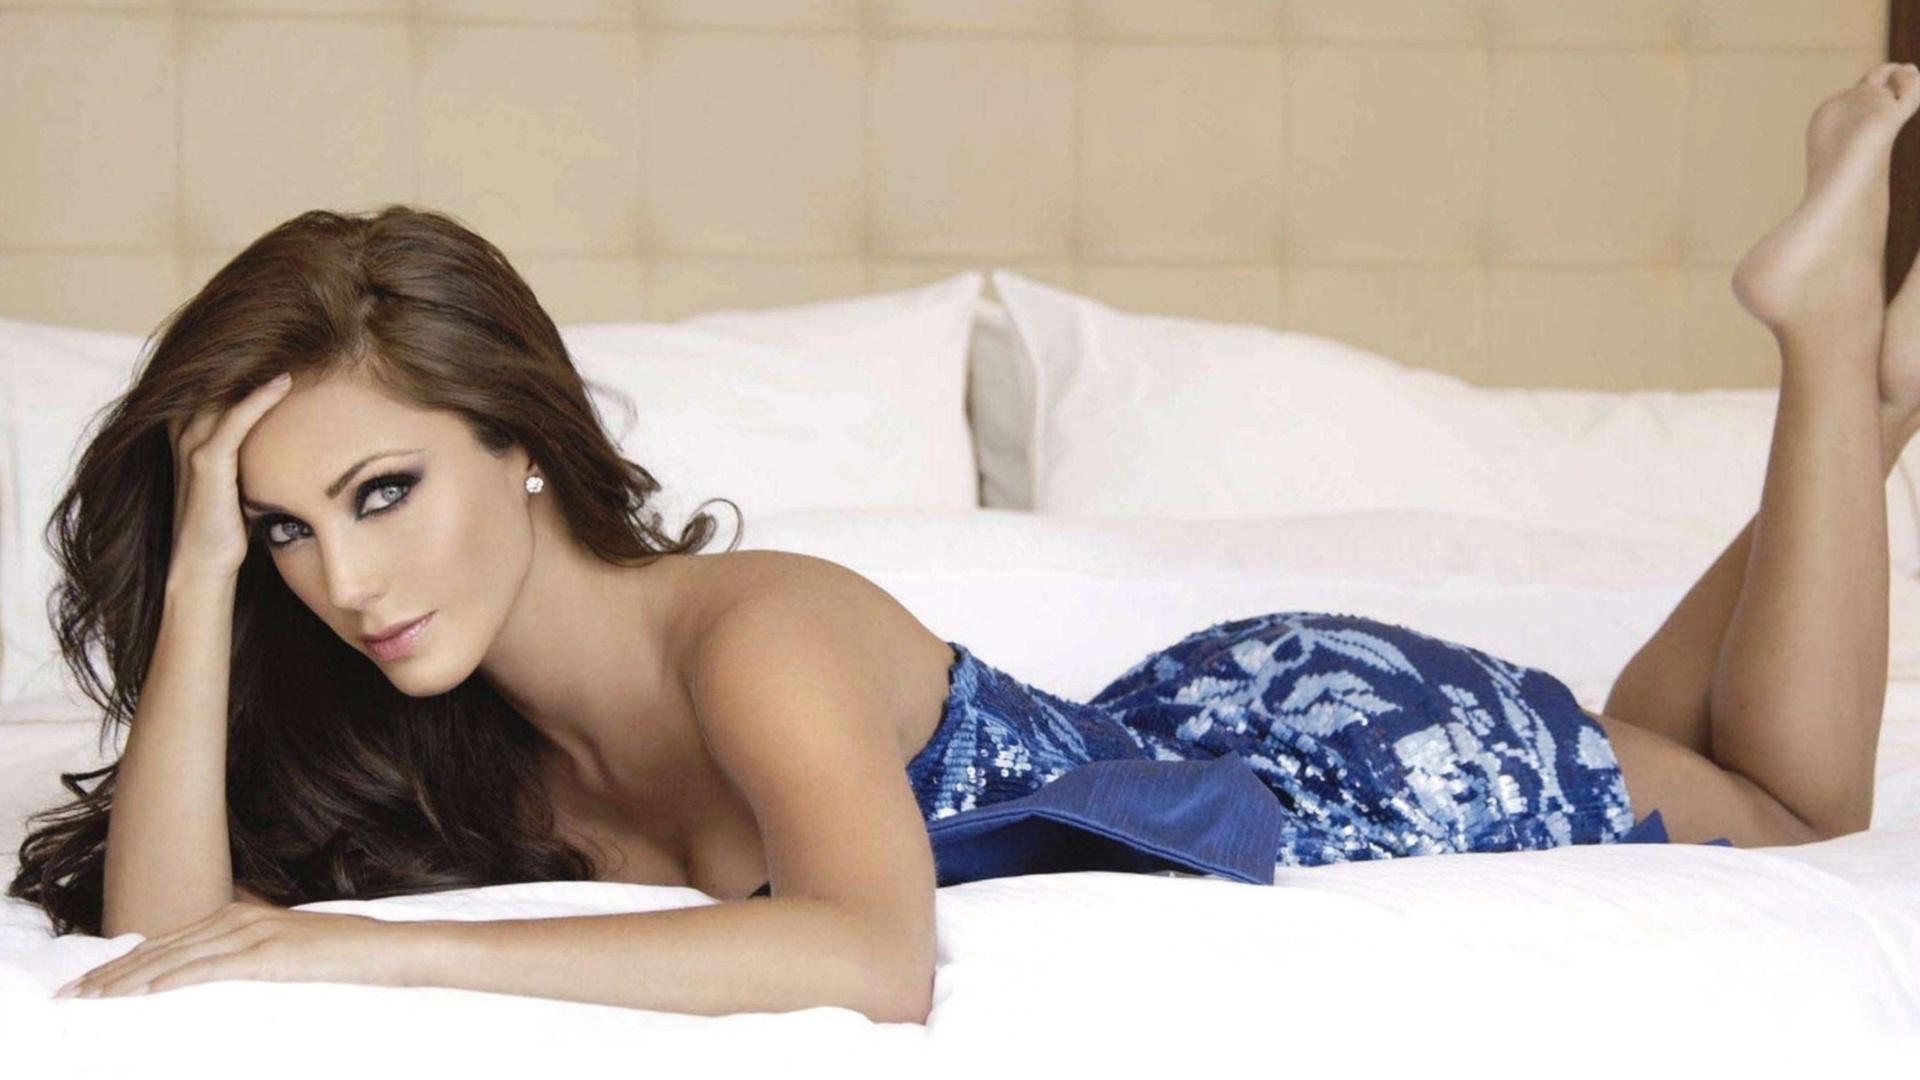 Anahi Hot anahi giovanna puente portilla women model actress sexy